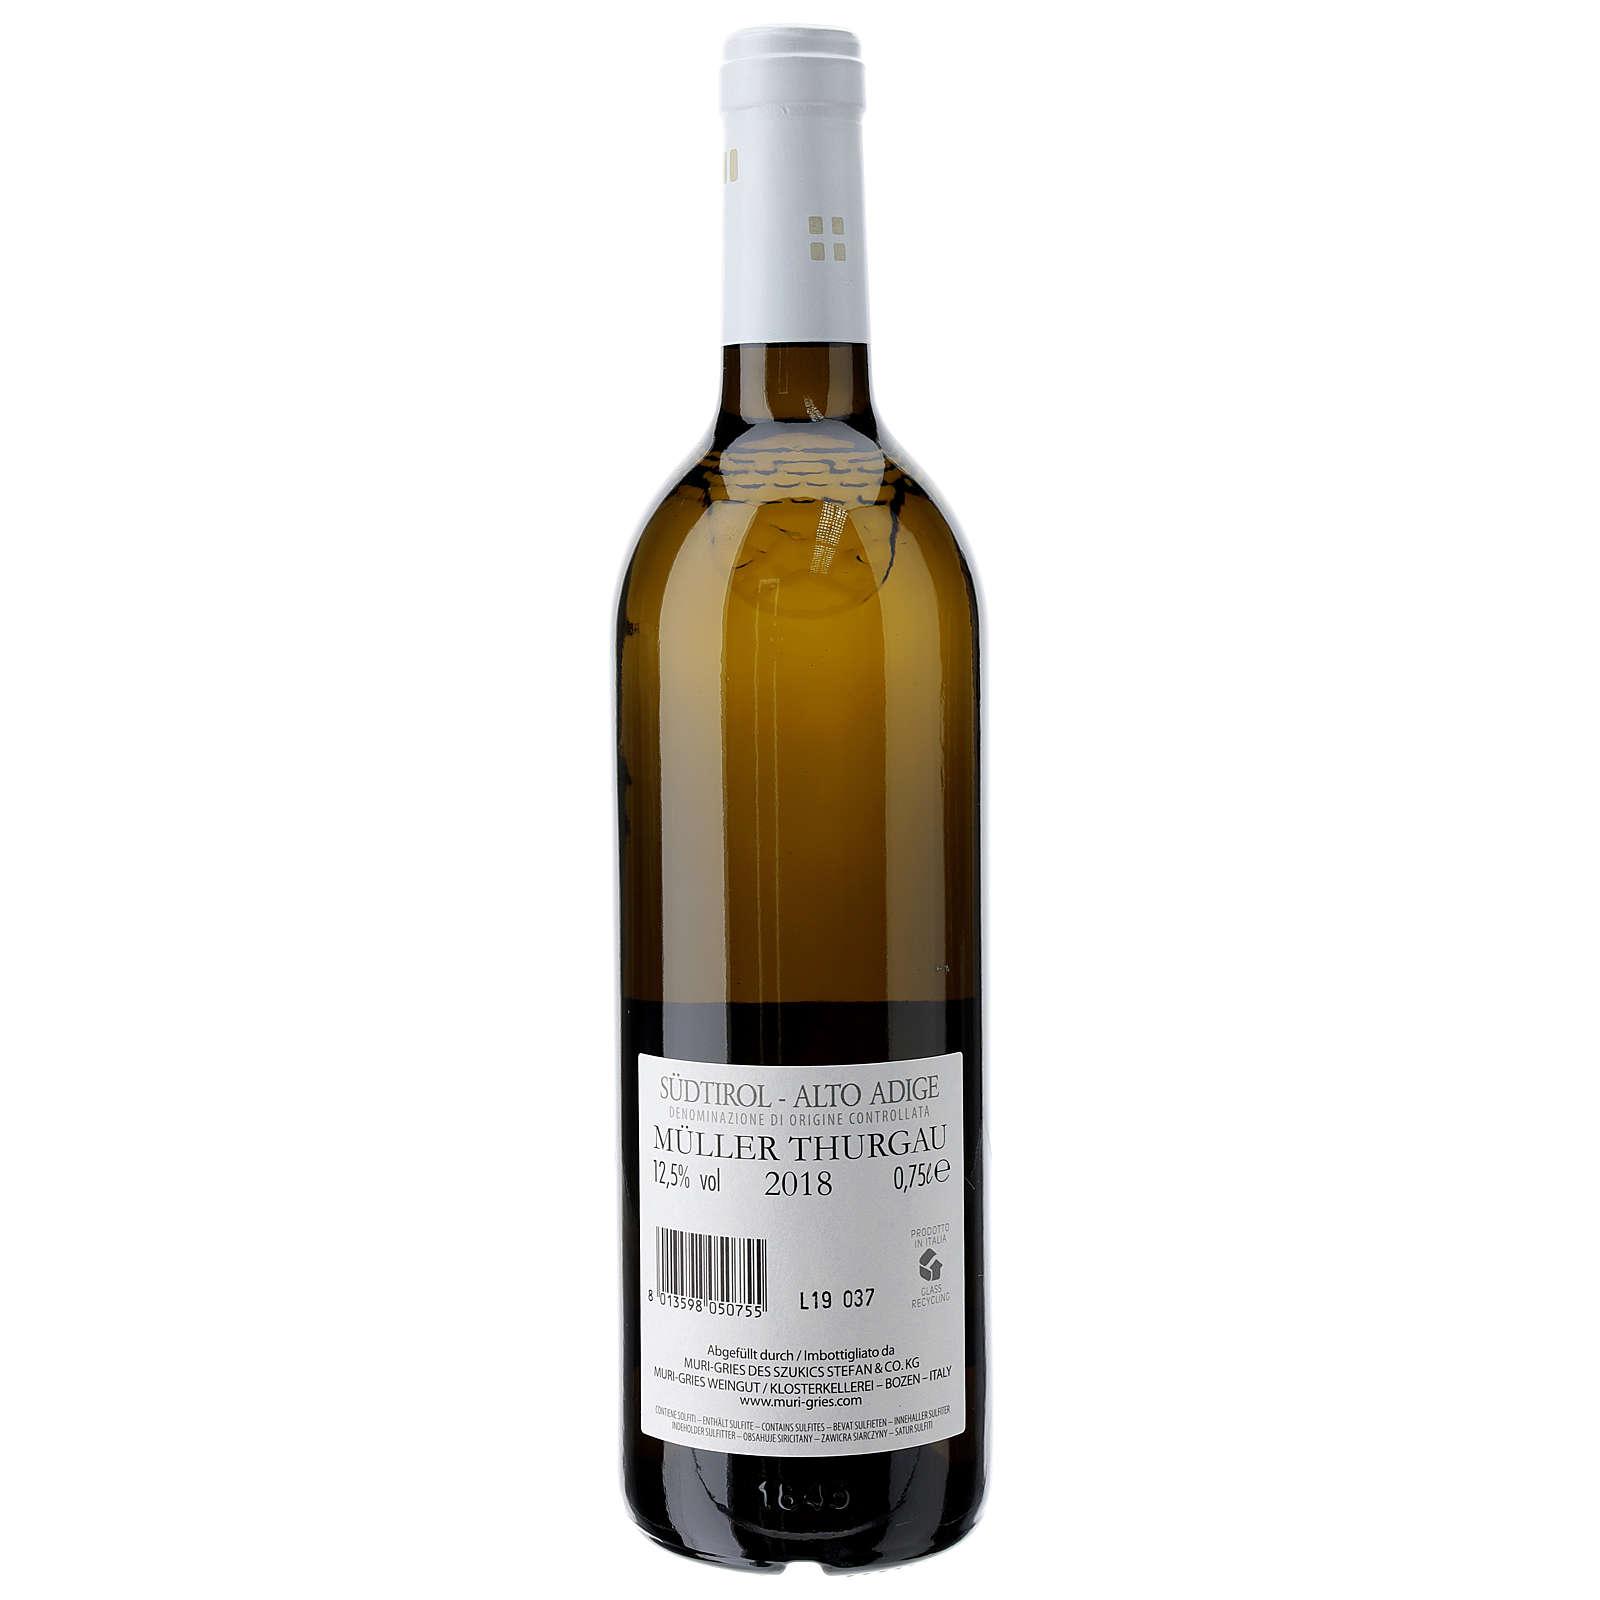 Vino Muller Thurgau DOC 2018 Abadía Muri Gries 750 ml 3